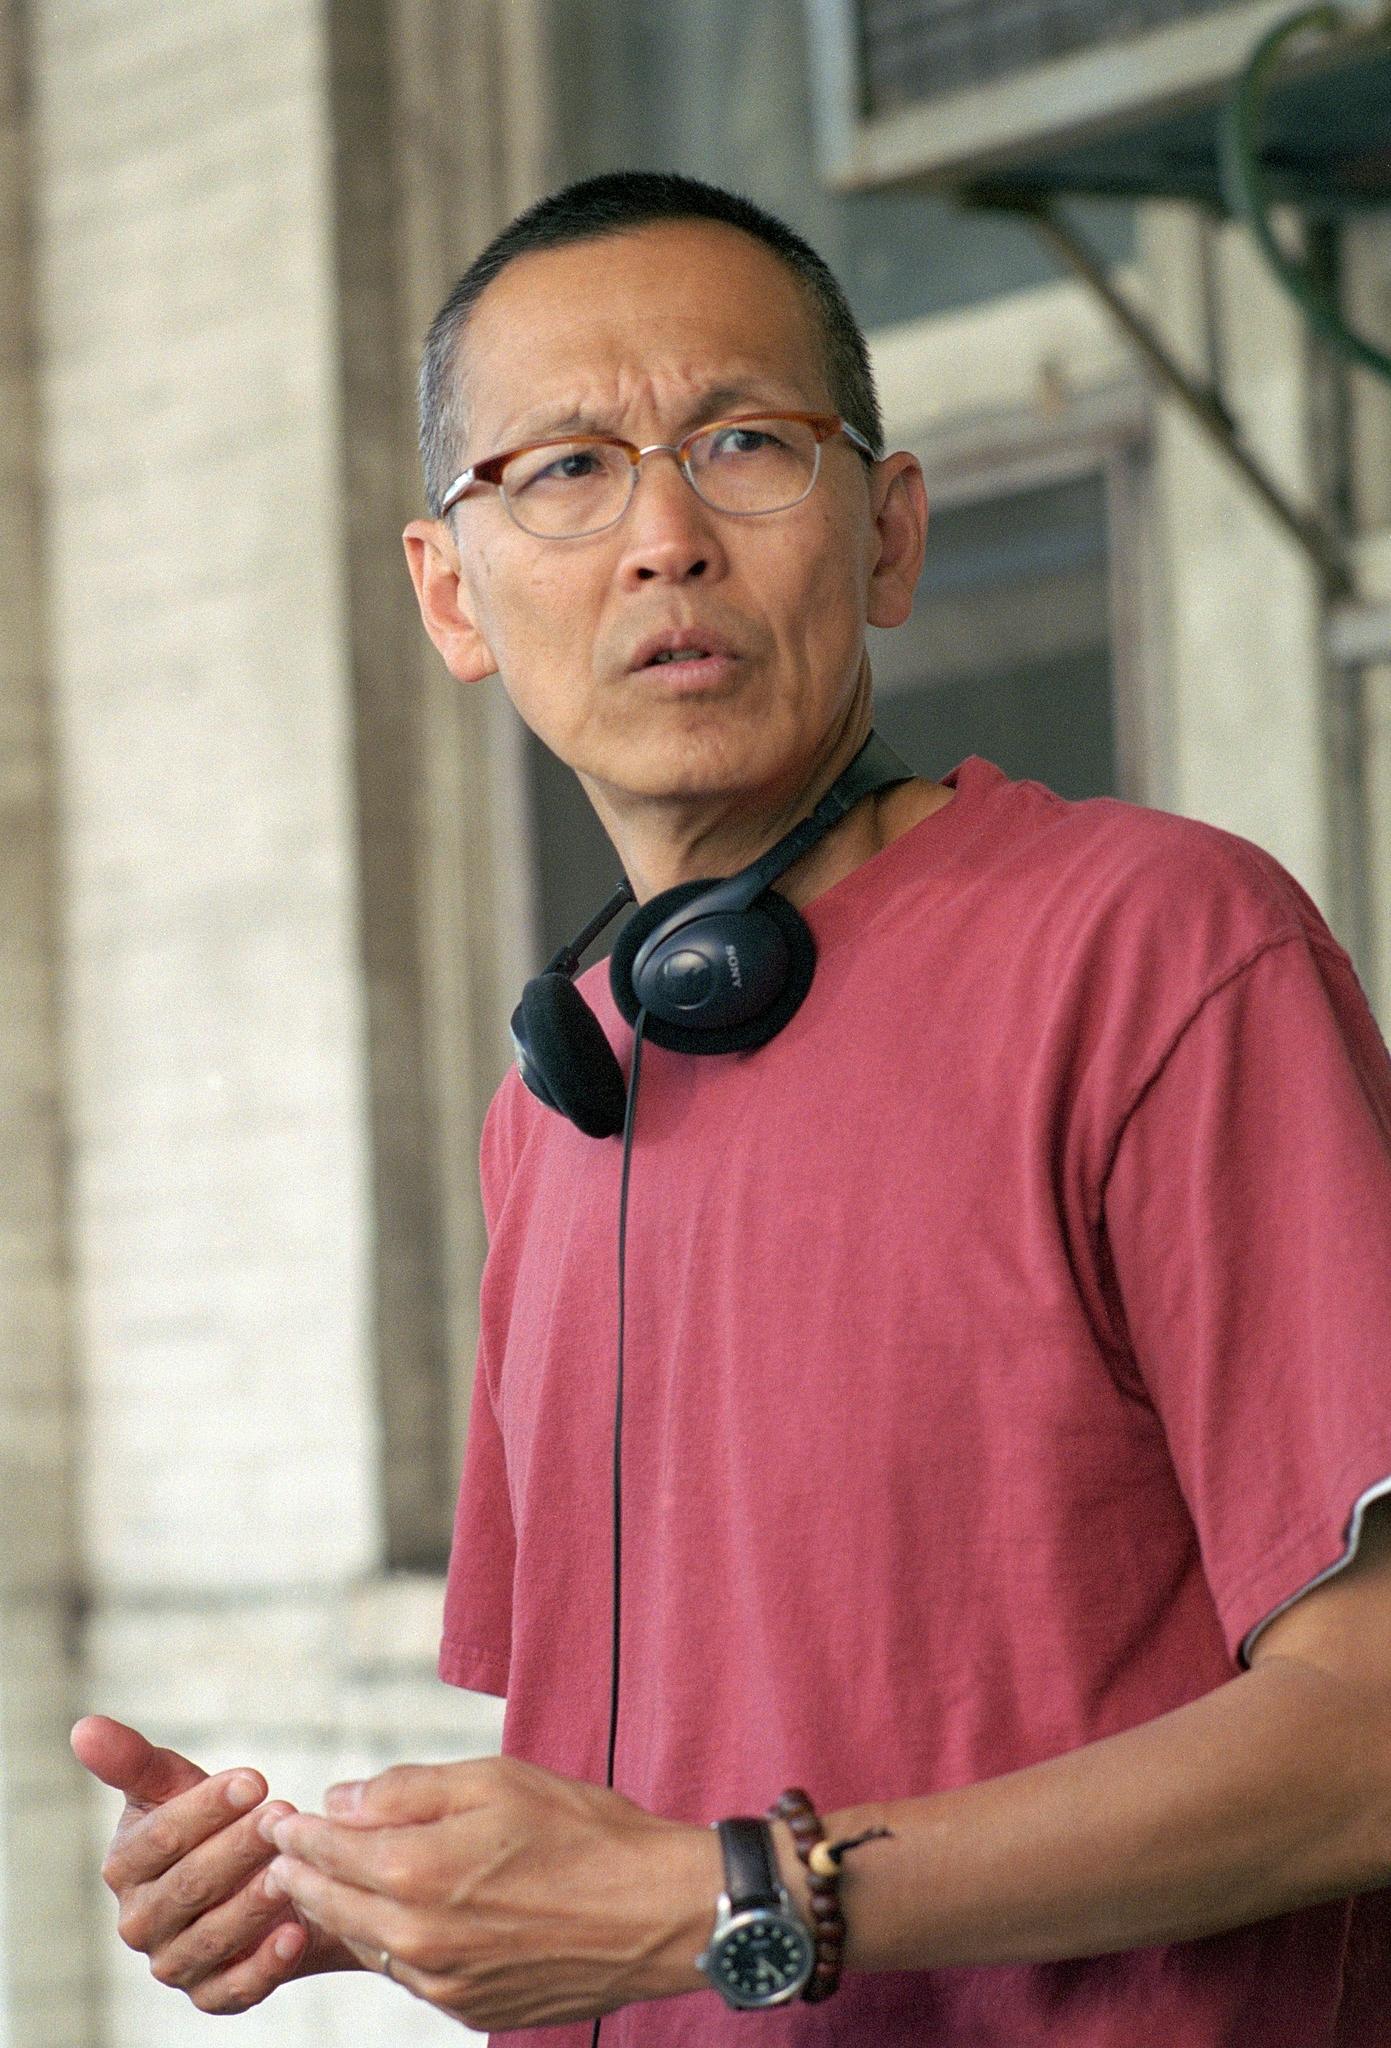 Wayne Wang in Because of Winn-Dixie (2005)